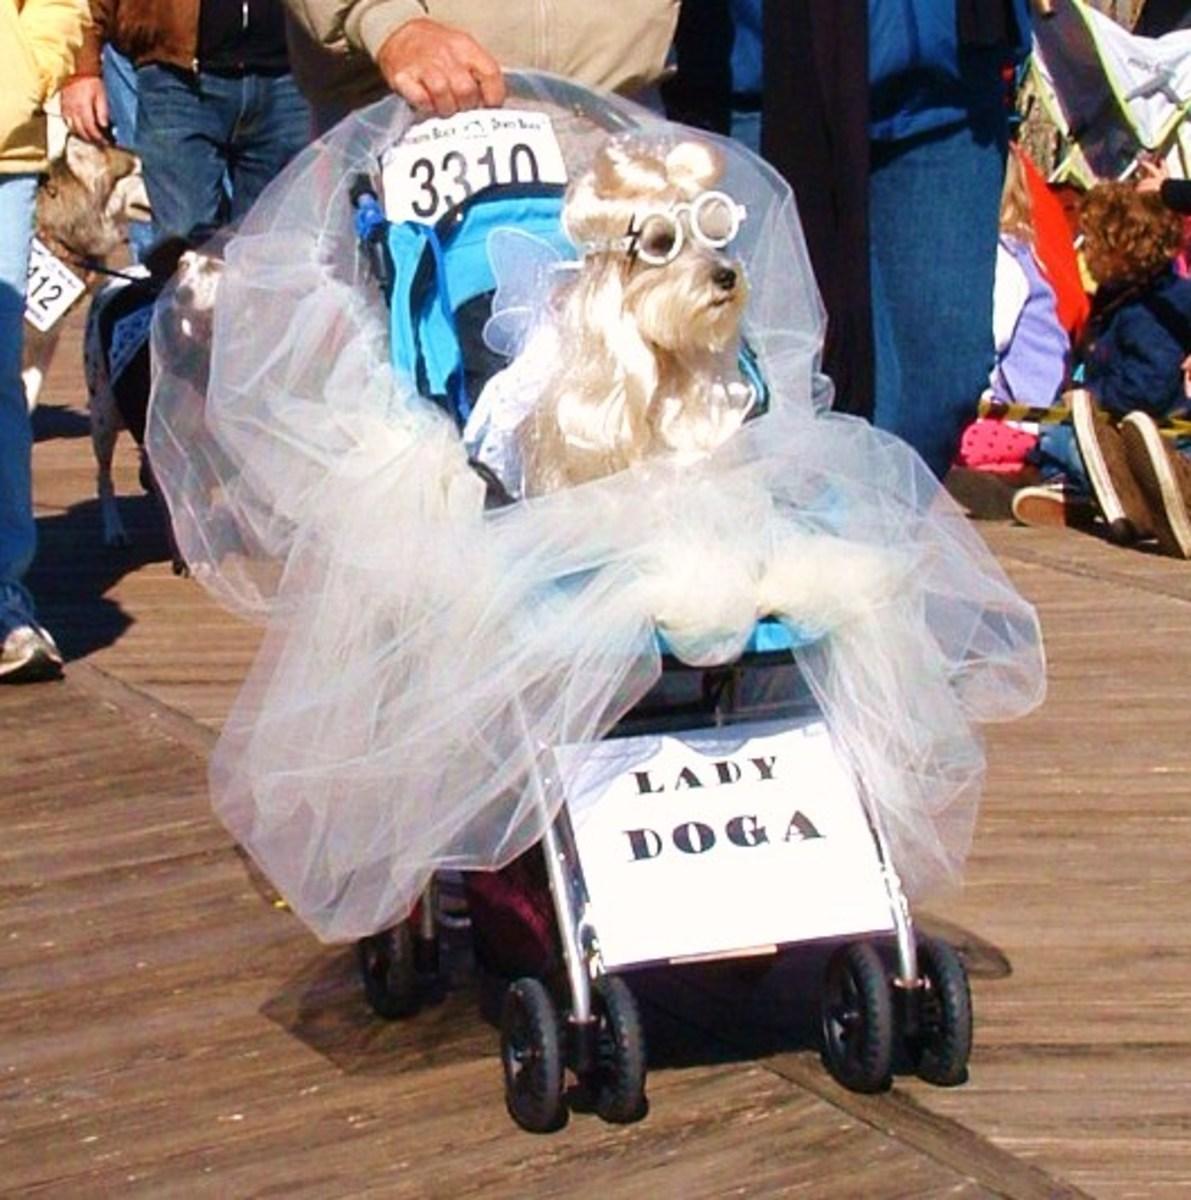 Dog in Lady Gaga costume in Pet Parade on Boardwalk.